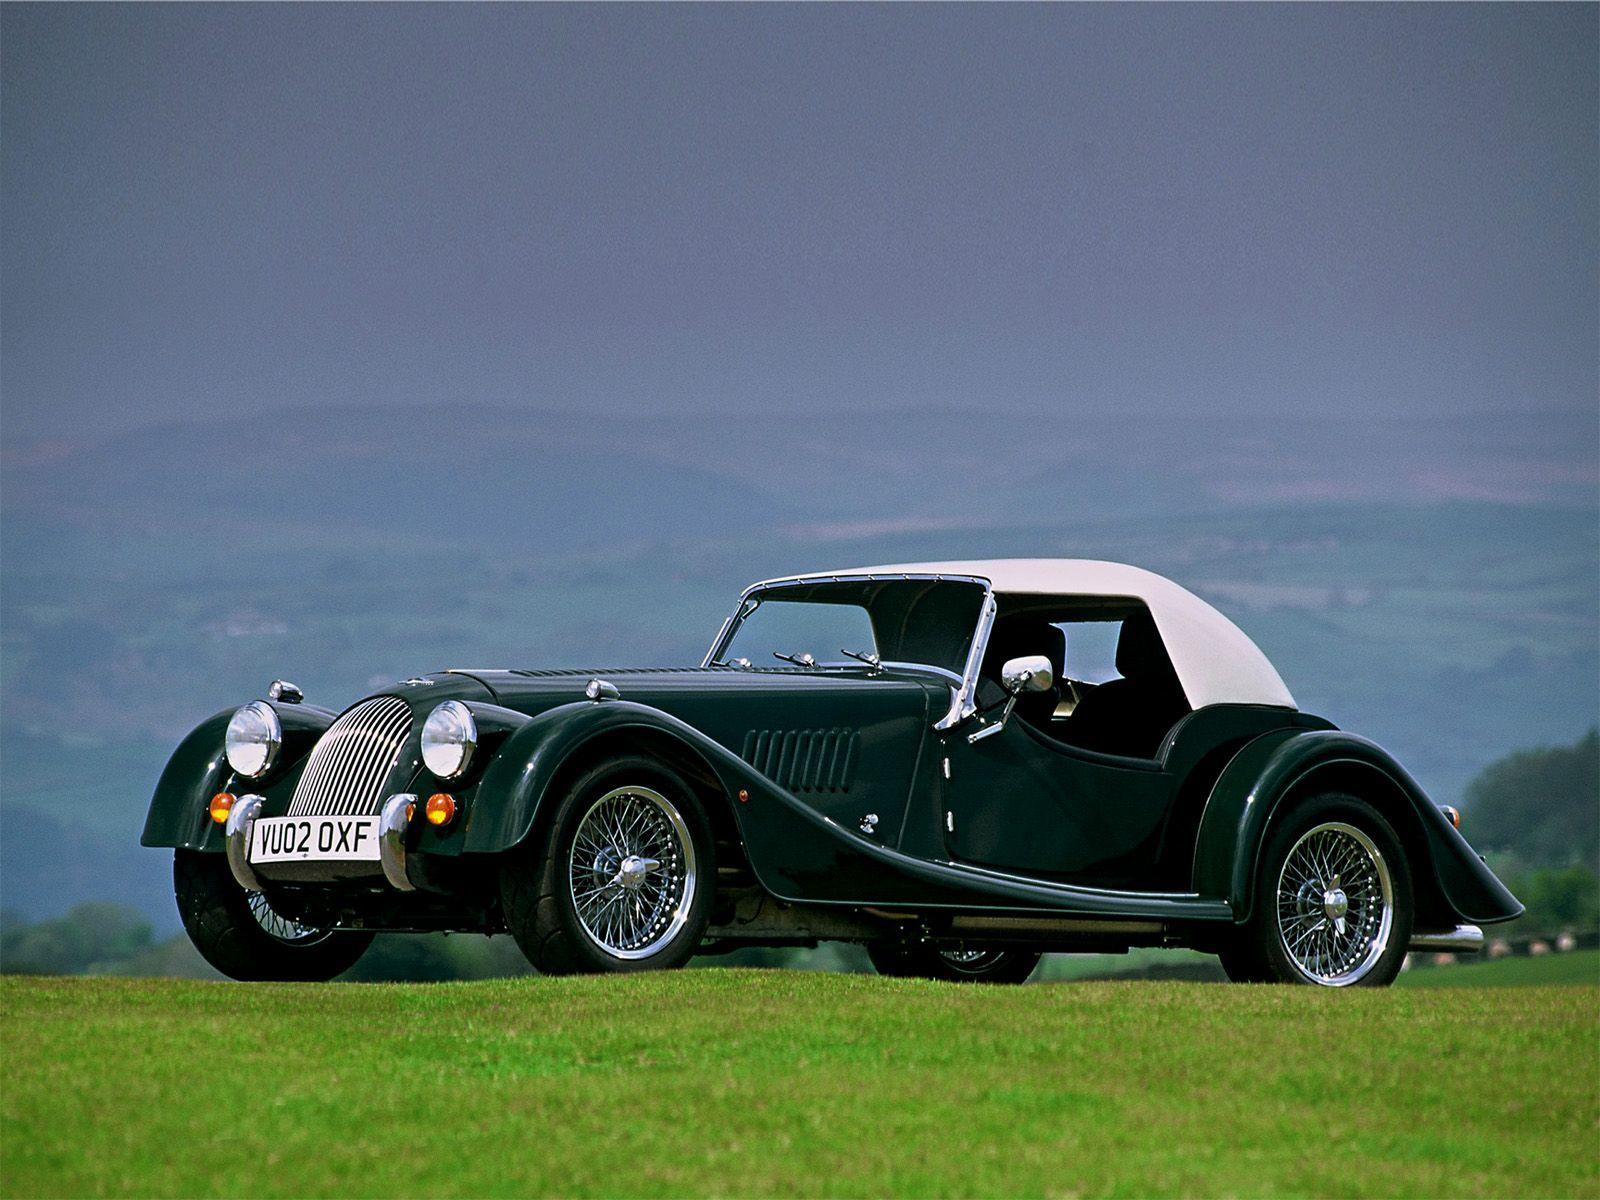 1968 Morgan Plus 8 #cars #coches | MORGAN | Pinterest | Cars and ...